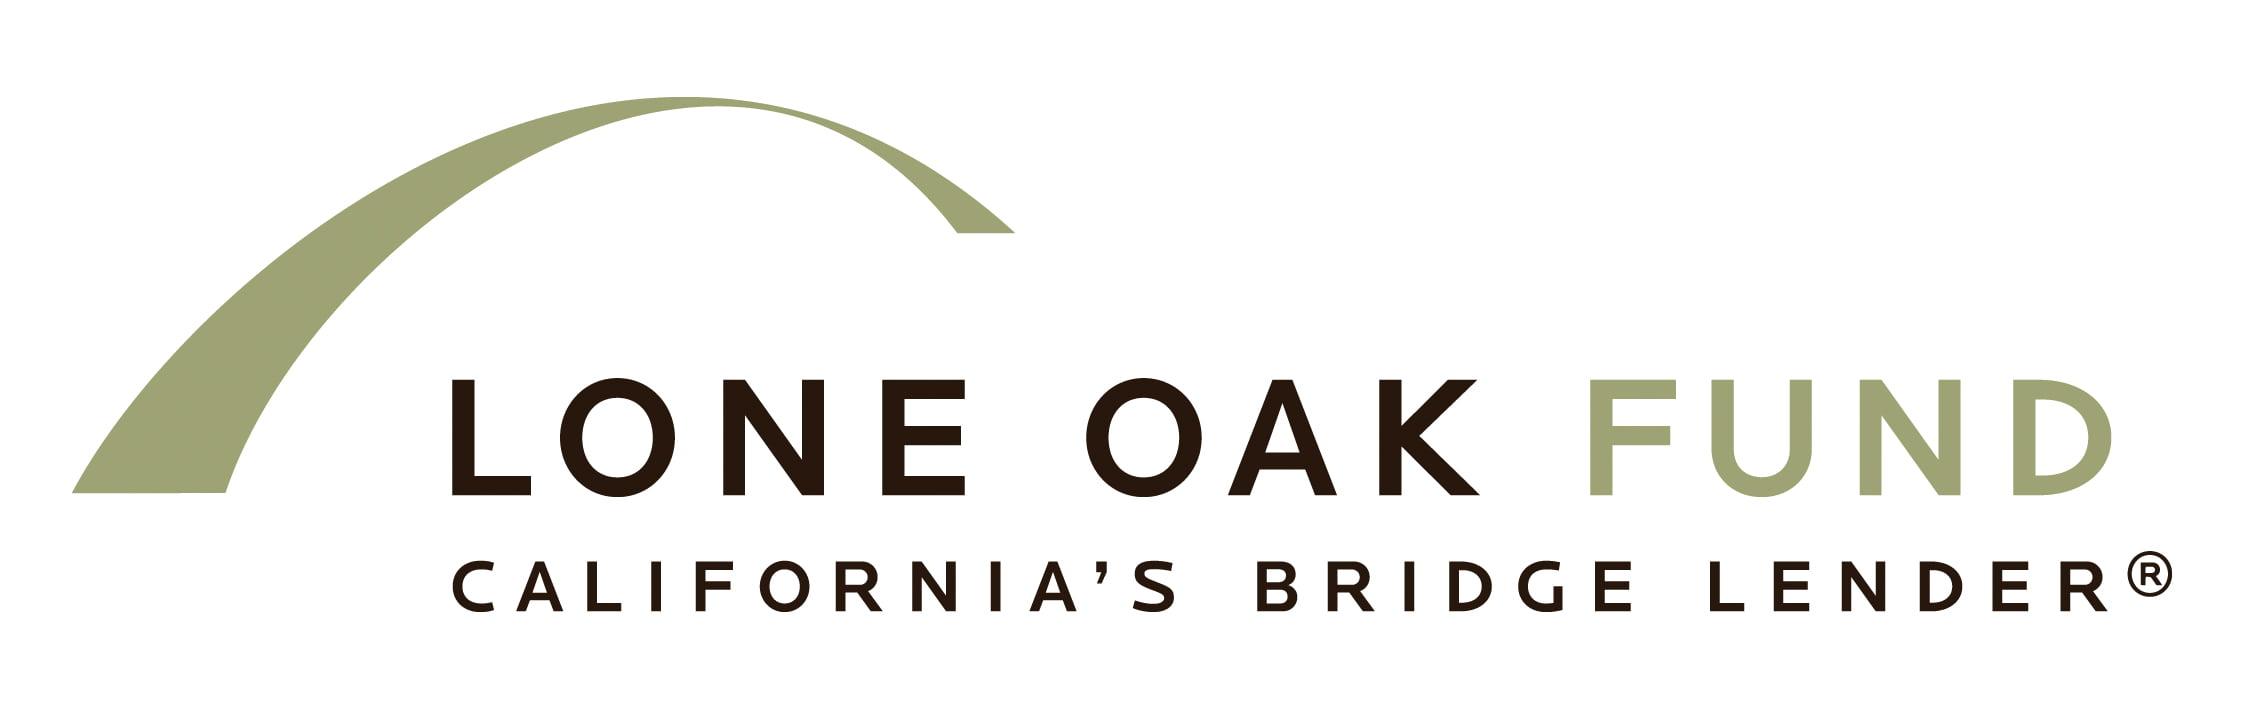 Lone Oak Fund Reaches $1 Billion in Unleveraged Capital